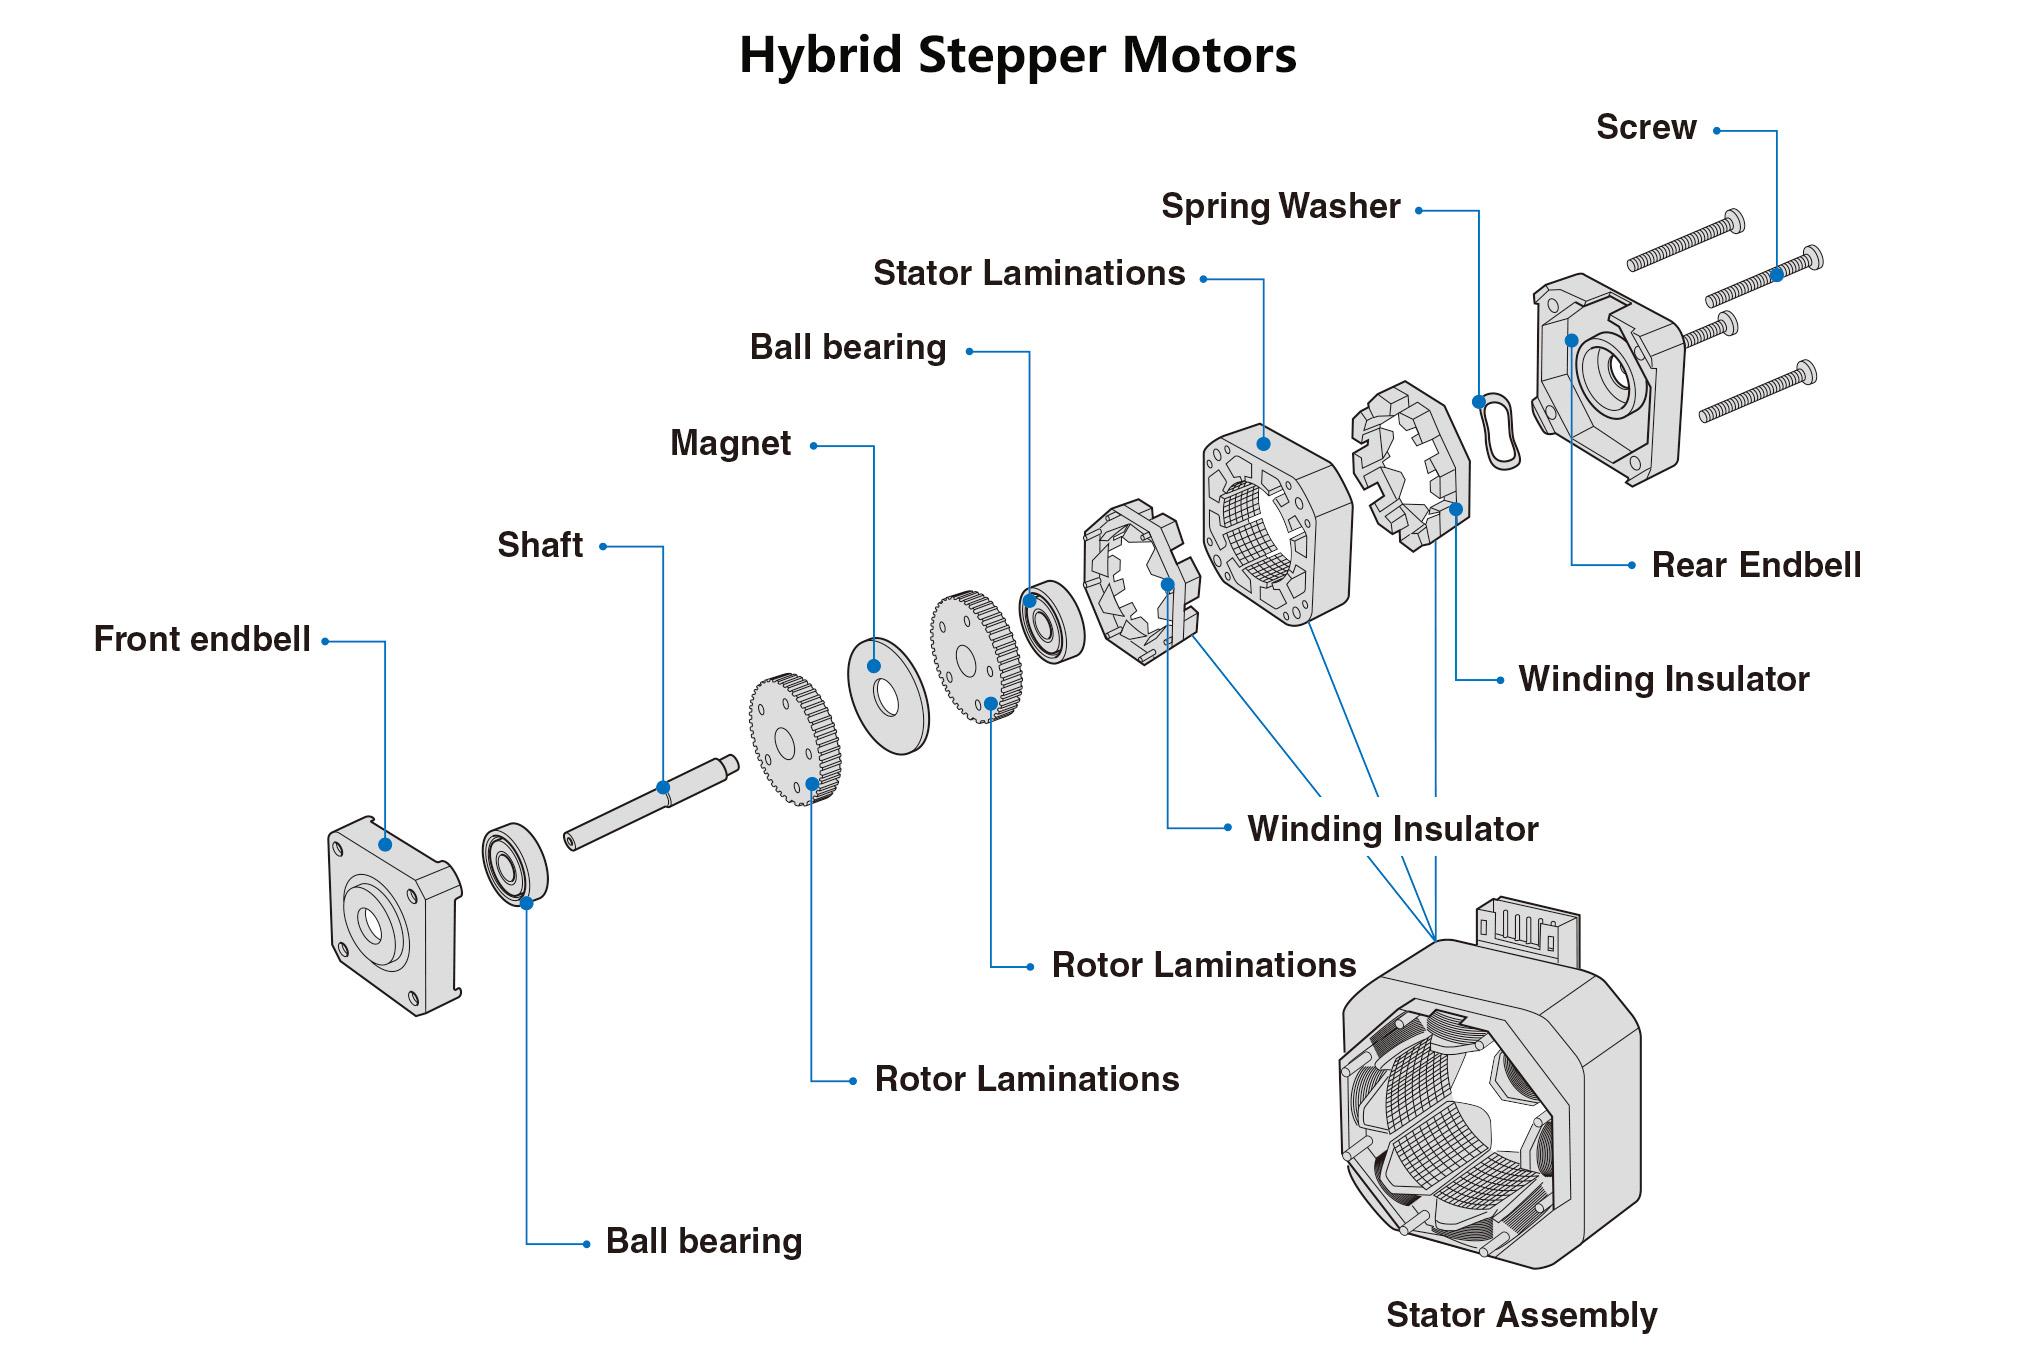 Hybrid Stepper Motors Structure